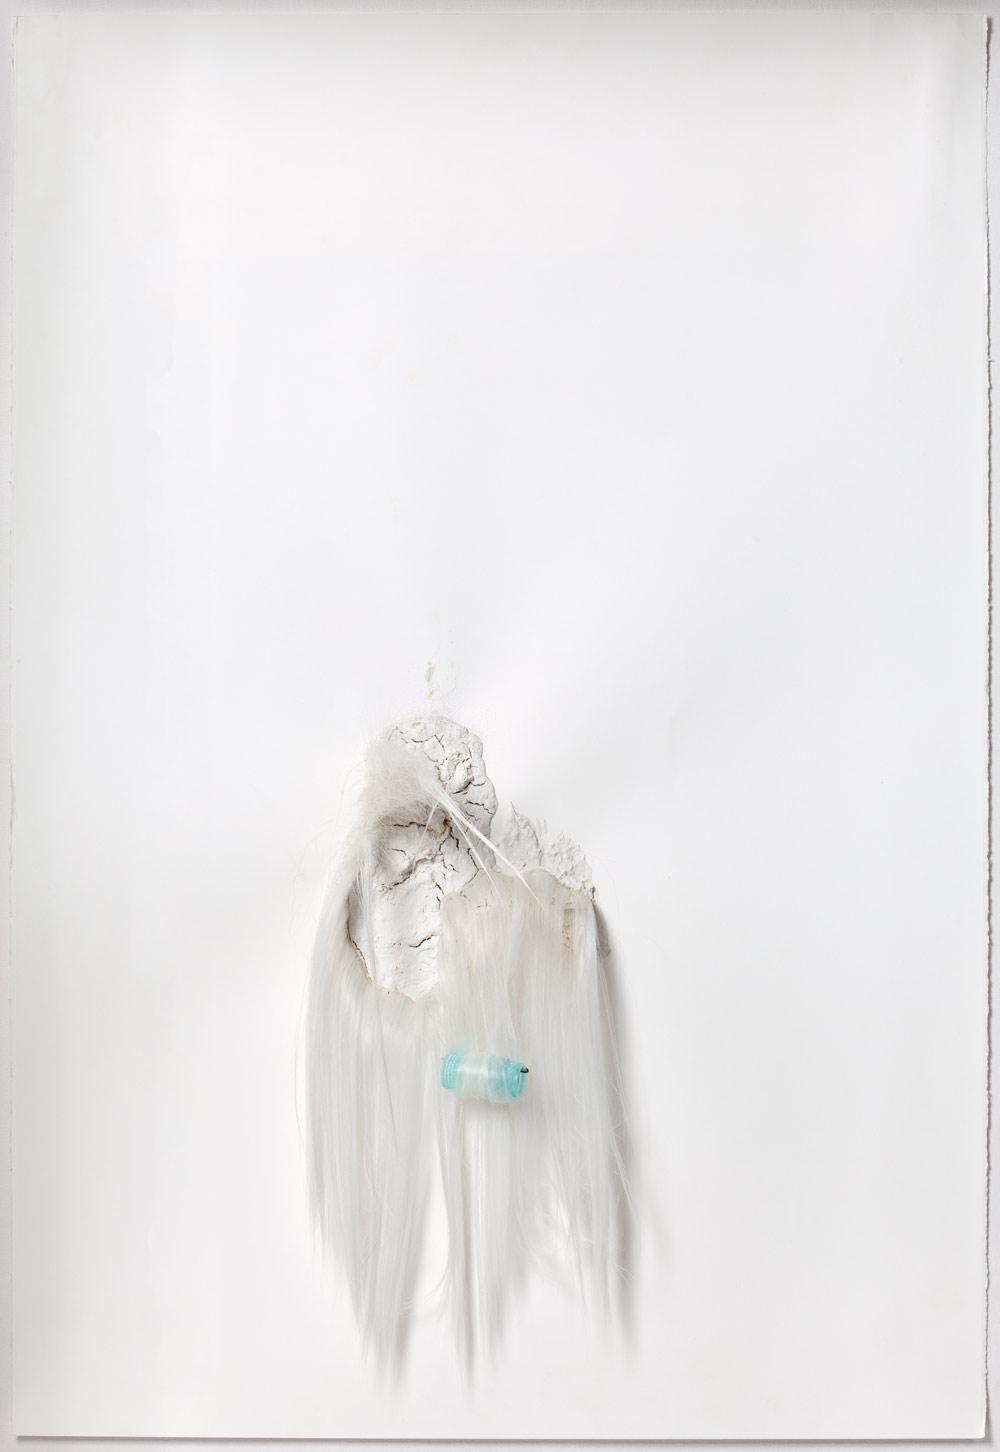 Chris Niemi - Untitled